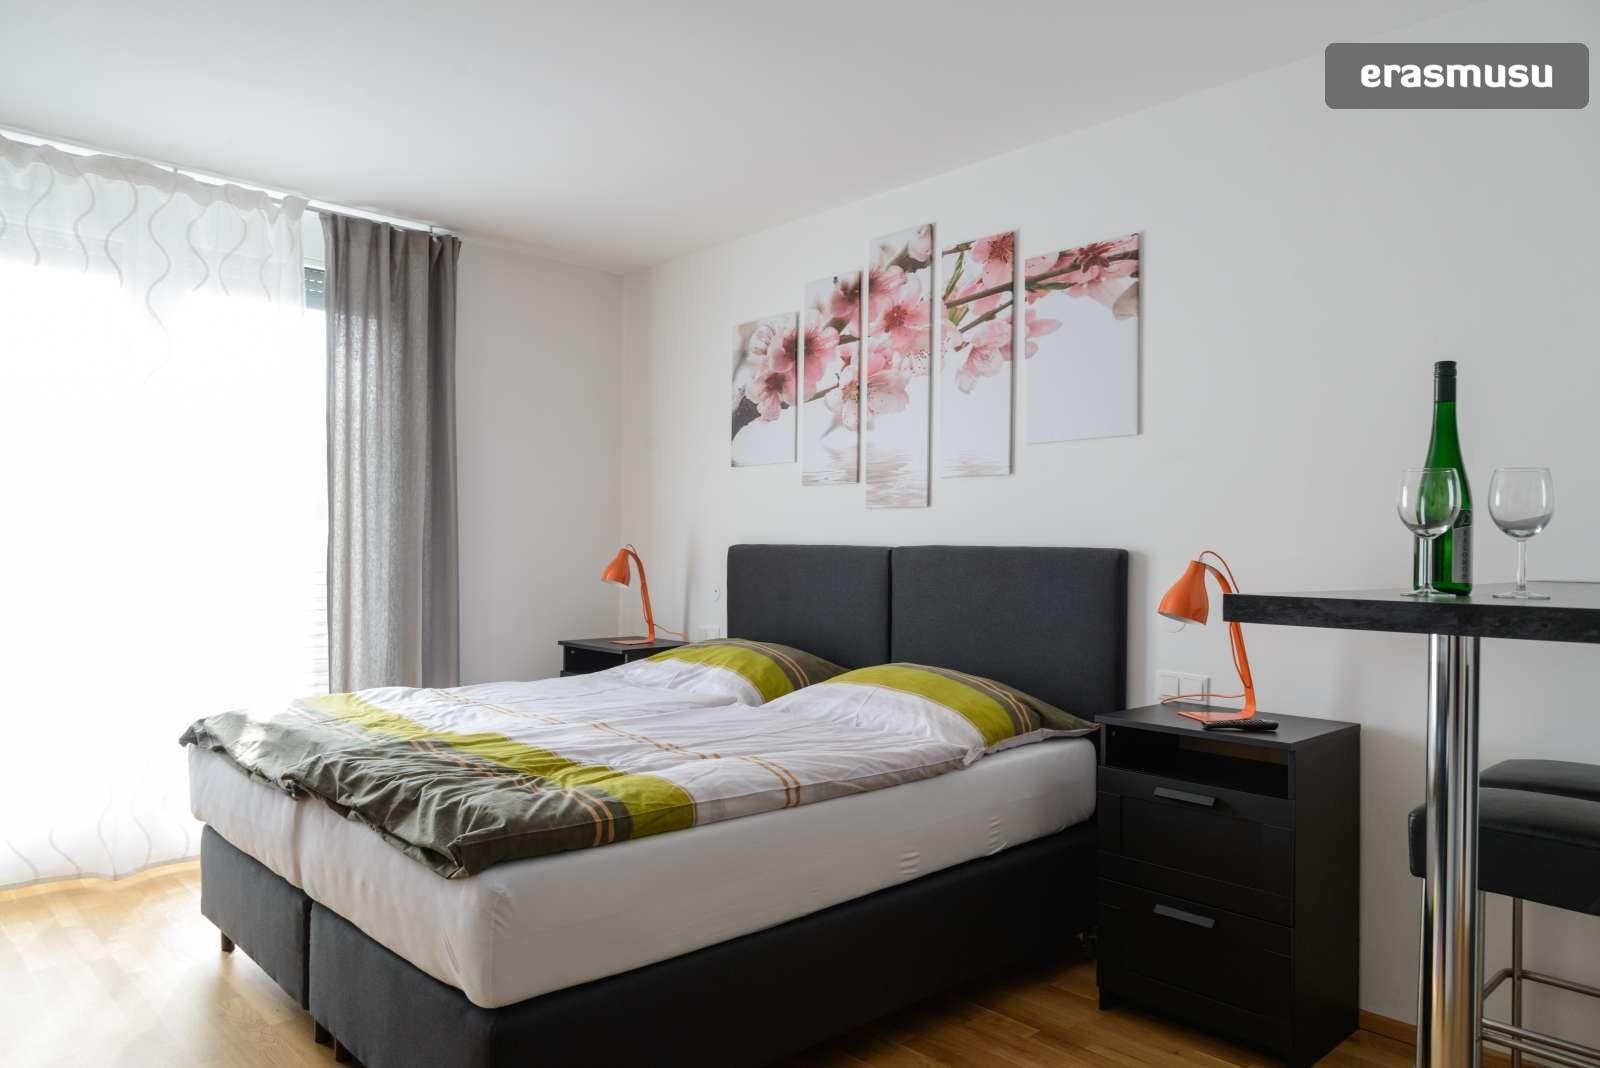 spacious-studio-apartment-rent-aspern-area-donaustadt-5896fcb9a0